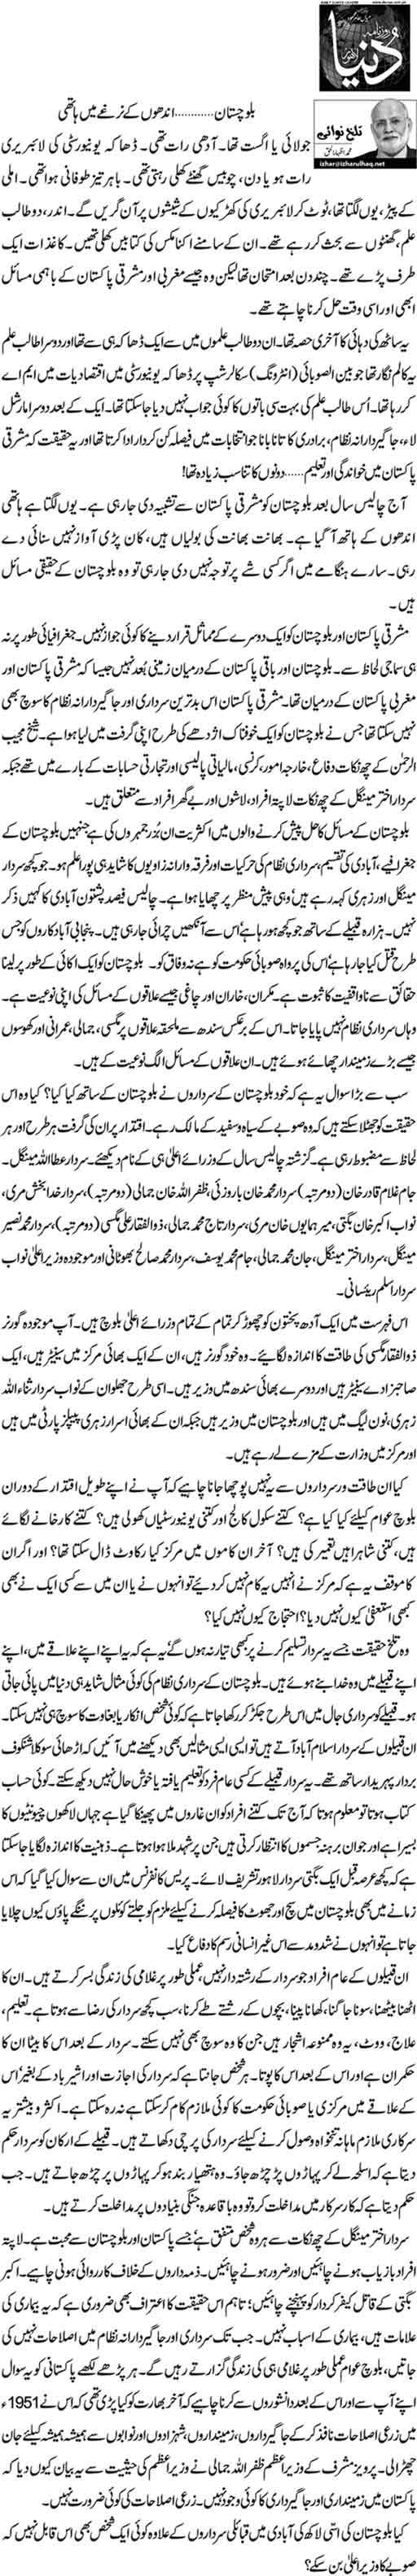 Balochistan...andhoon k narghay main hathi - M. Izhar ul Haq